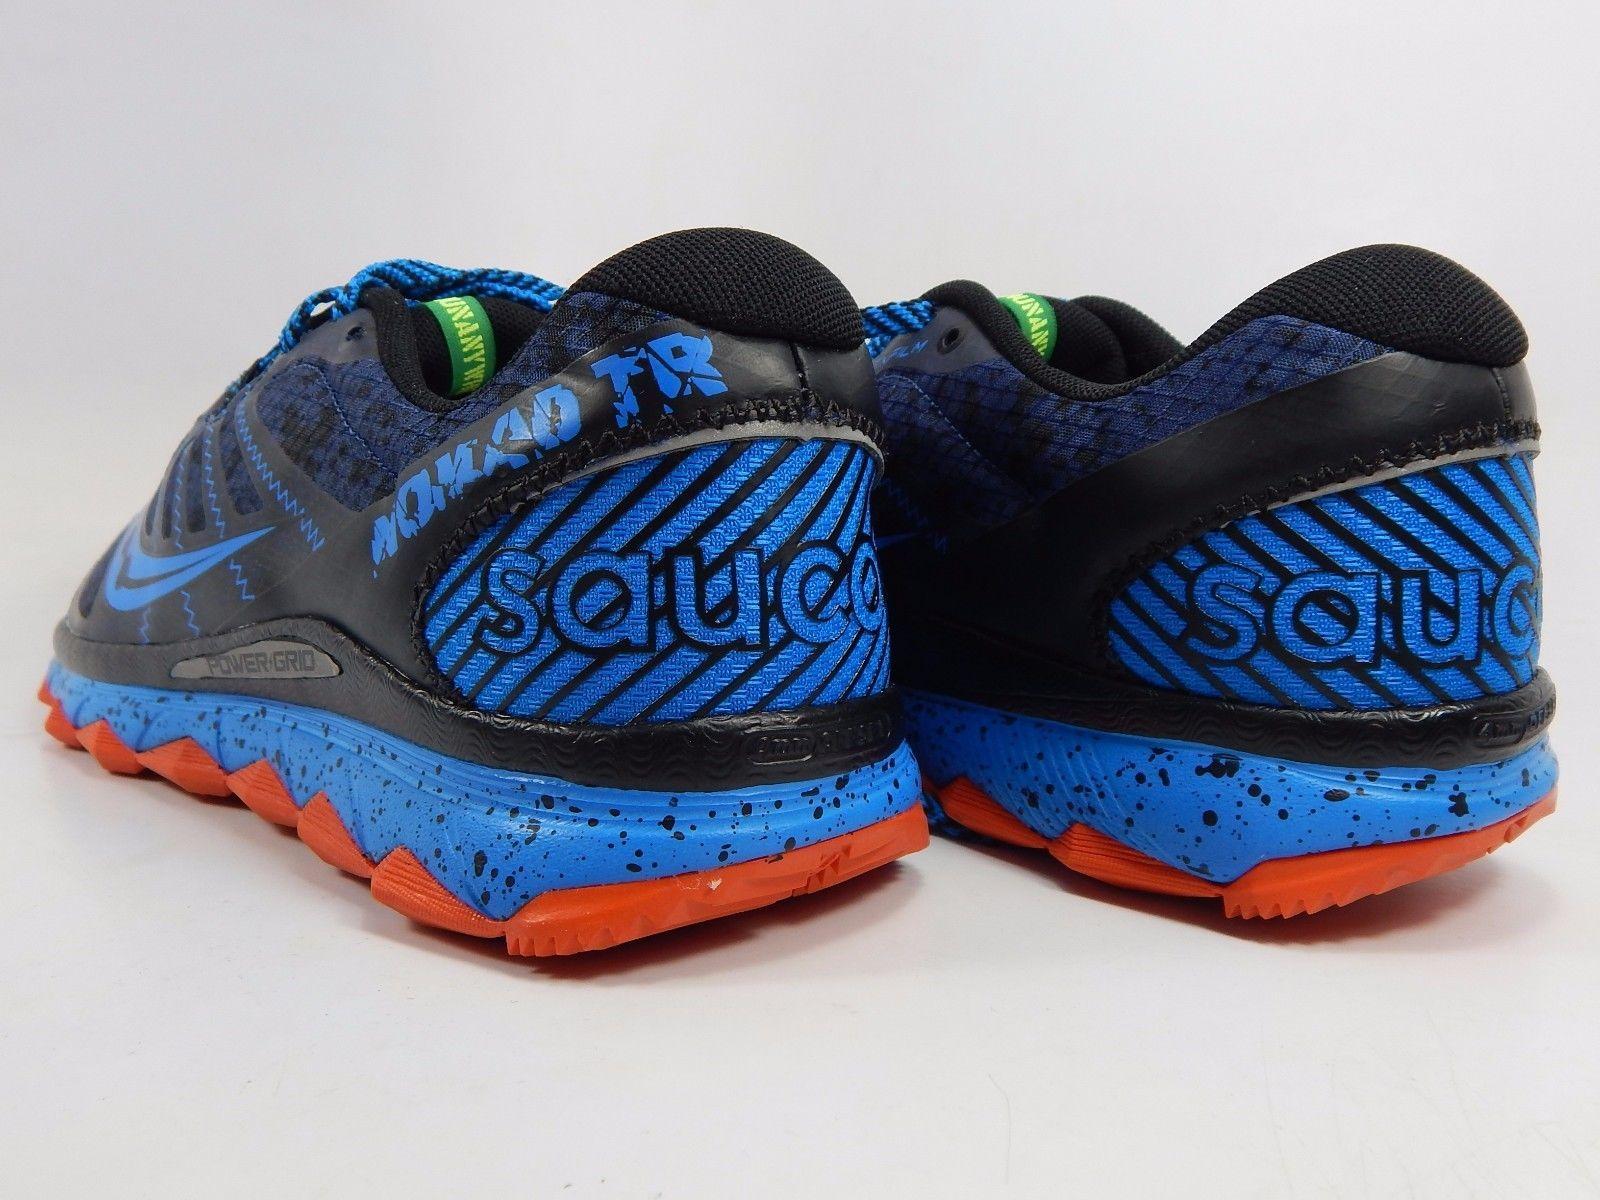 Saucony Nomad TR Men's Trail Running Shoes Size US 9 M (D) EU 42.5 Navy S20287-5